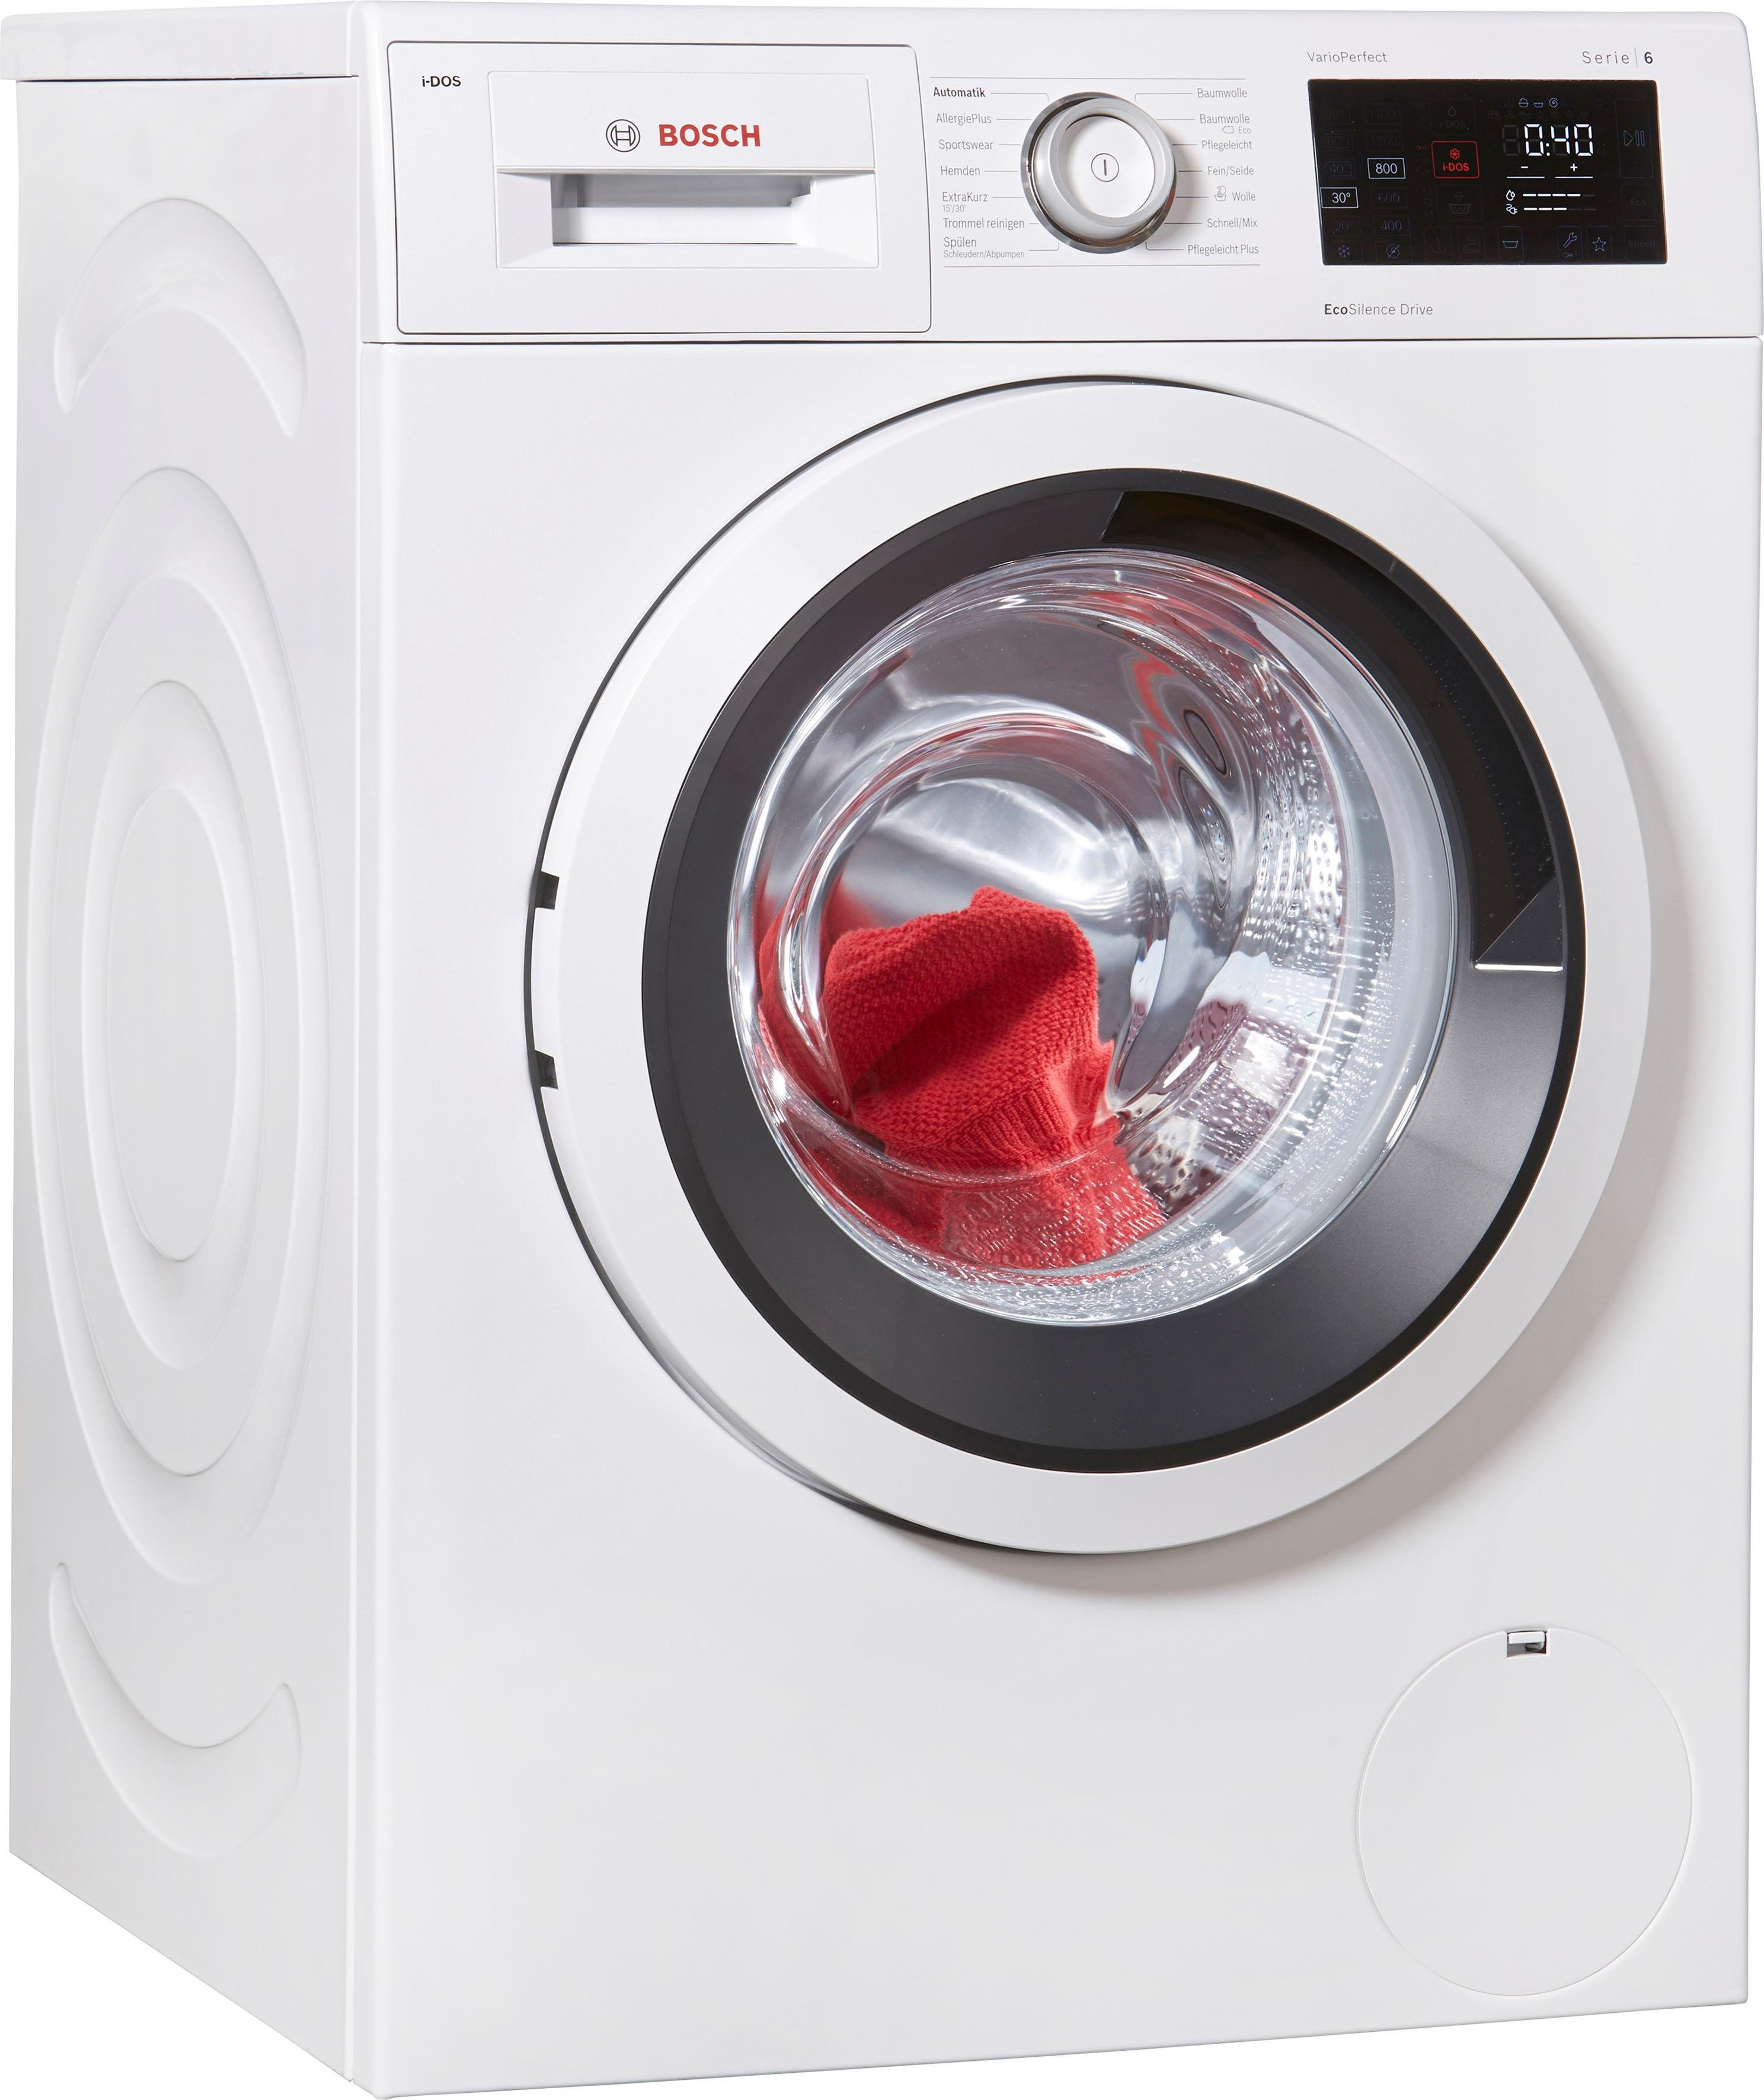 Bosch wasmachine Serie 6 WAT286V0, 8 kg, 1400 tpm goedkoop op otto.nl kopen